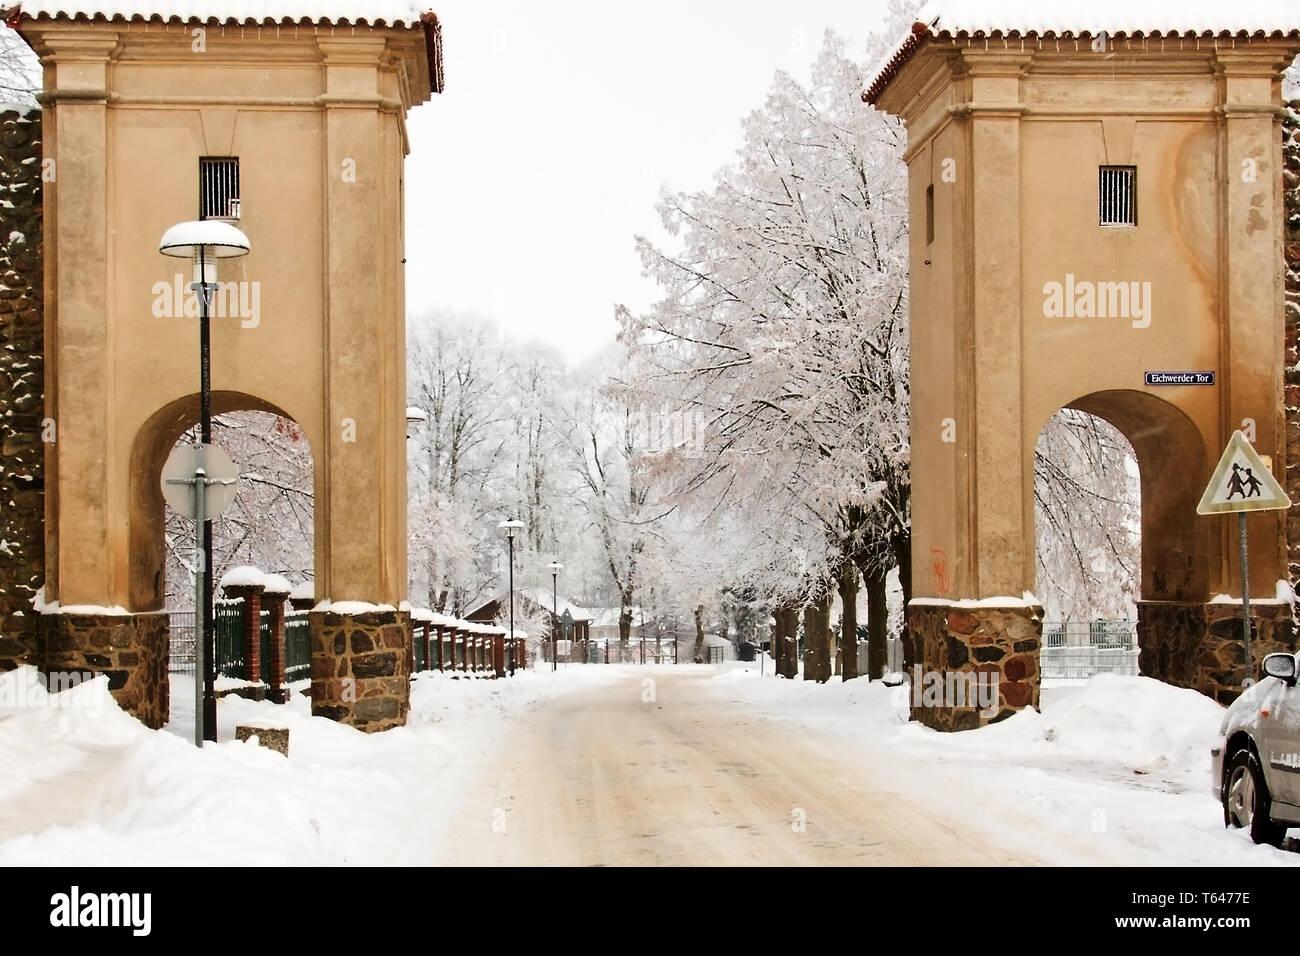 winterly Uckermark, a Region in northeast Germany, Brandenburg - Stock Image